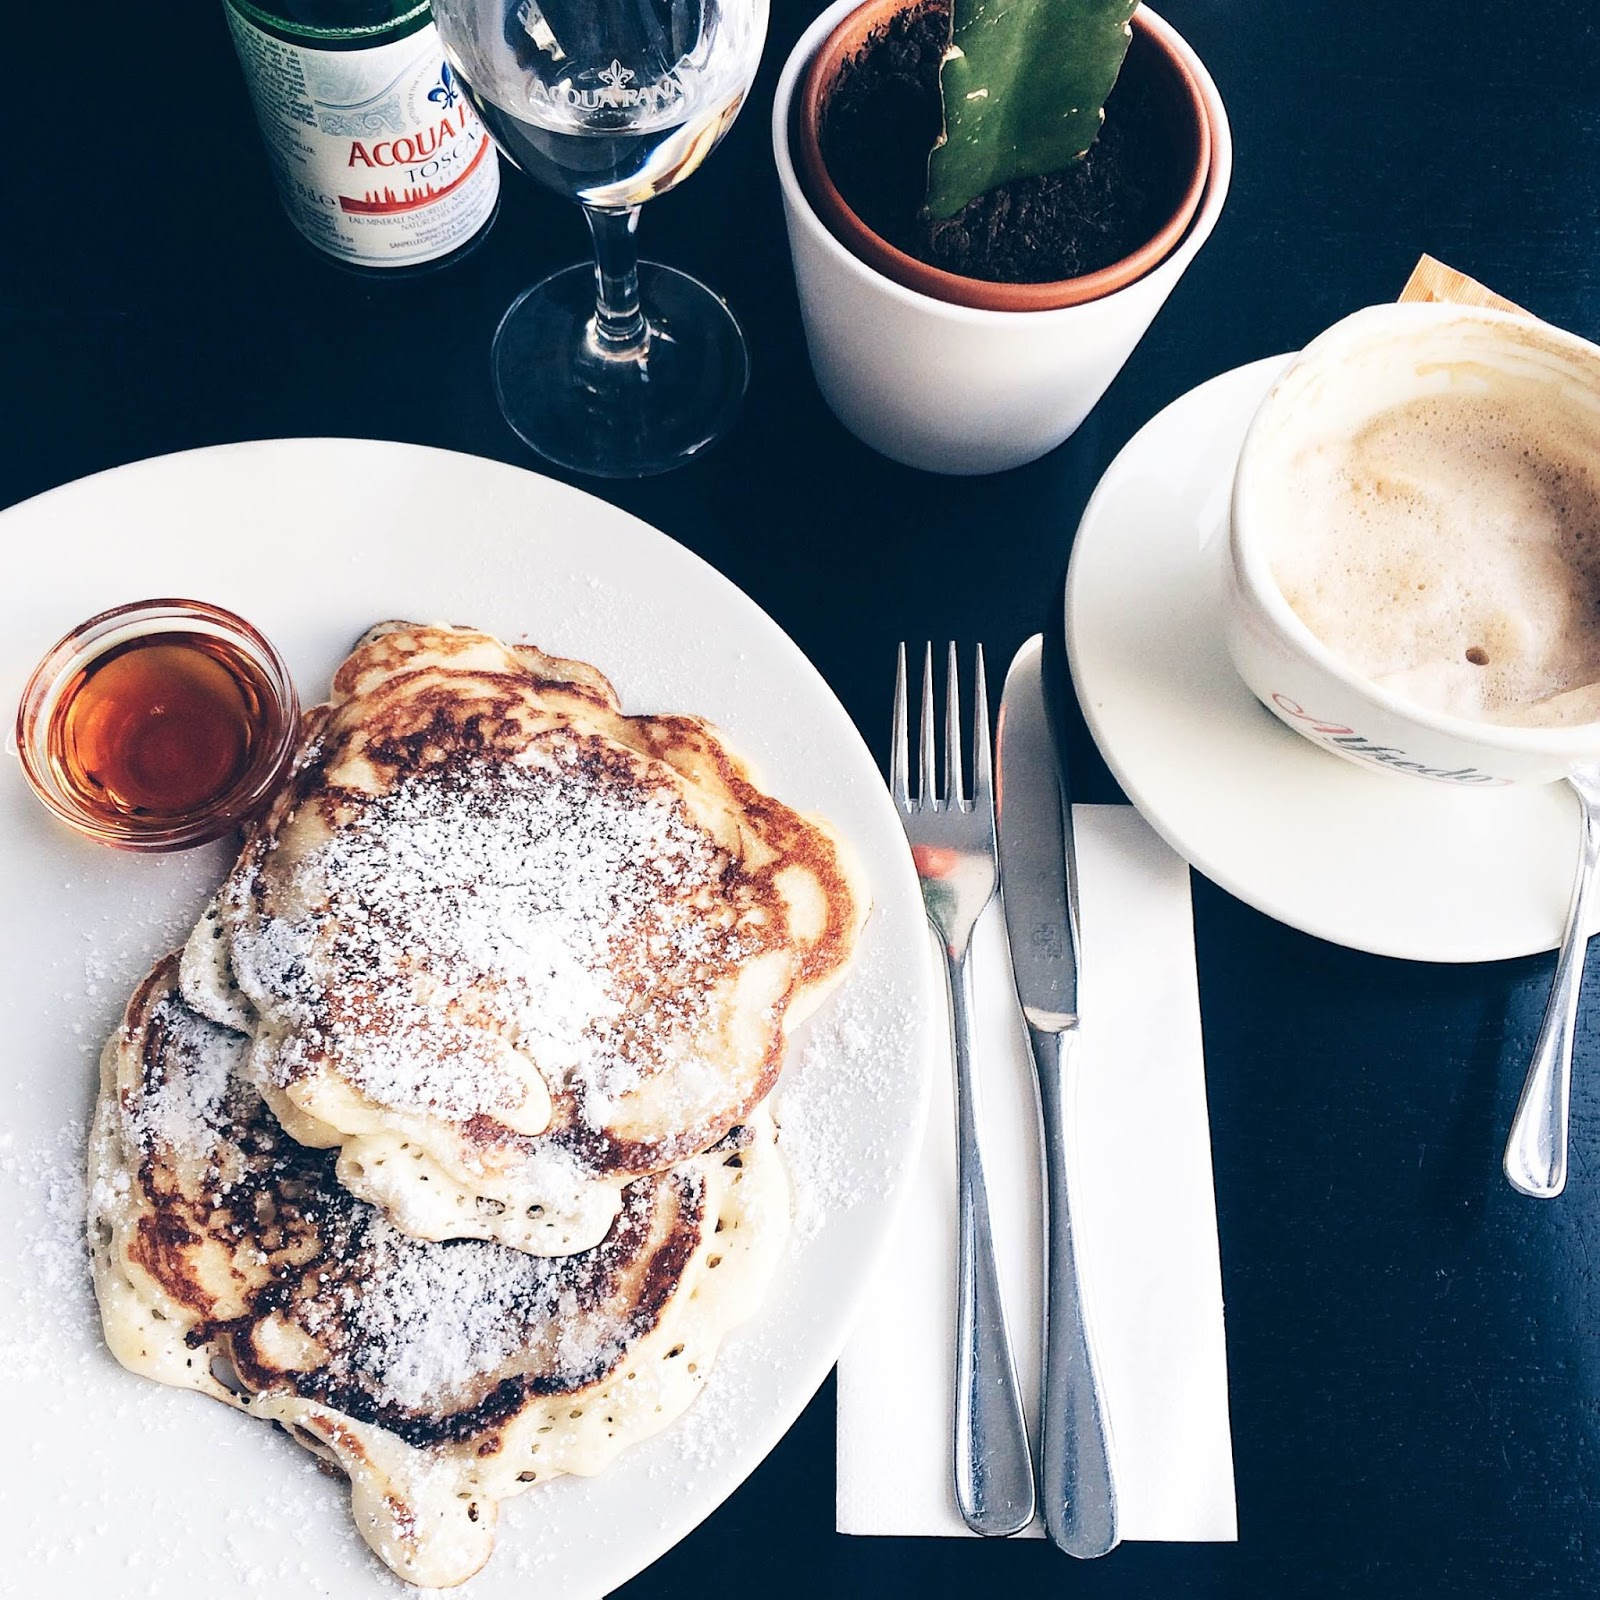 wiener platz best cafes pancakes breafast in munich